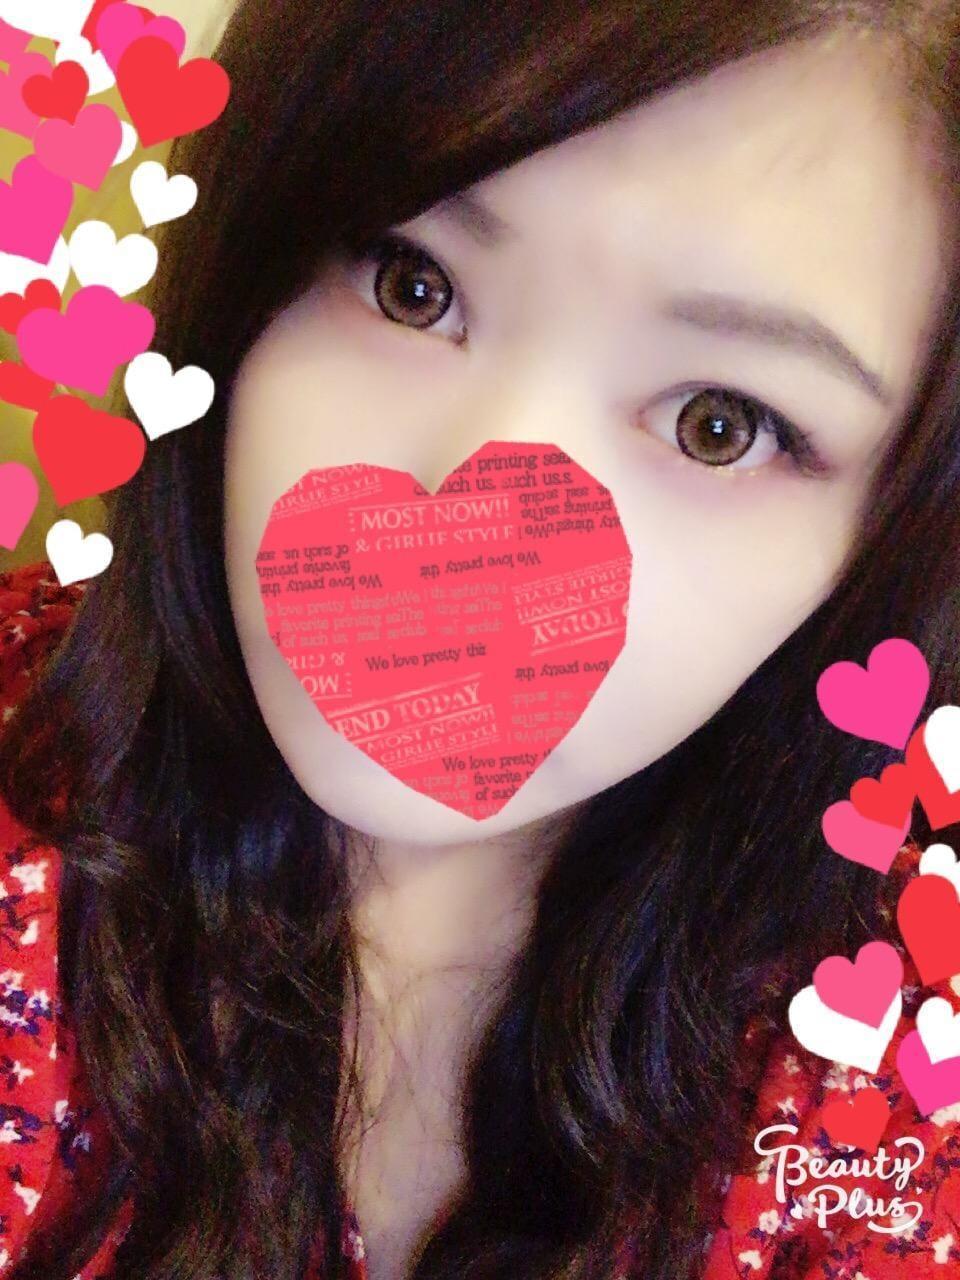 「January 18th ☆」01/18(01/18) 17:51 | まどかの写メ・風俗動画